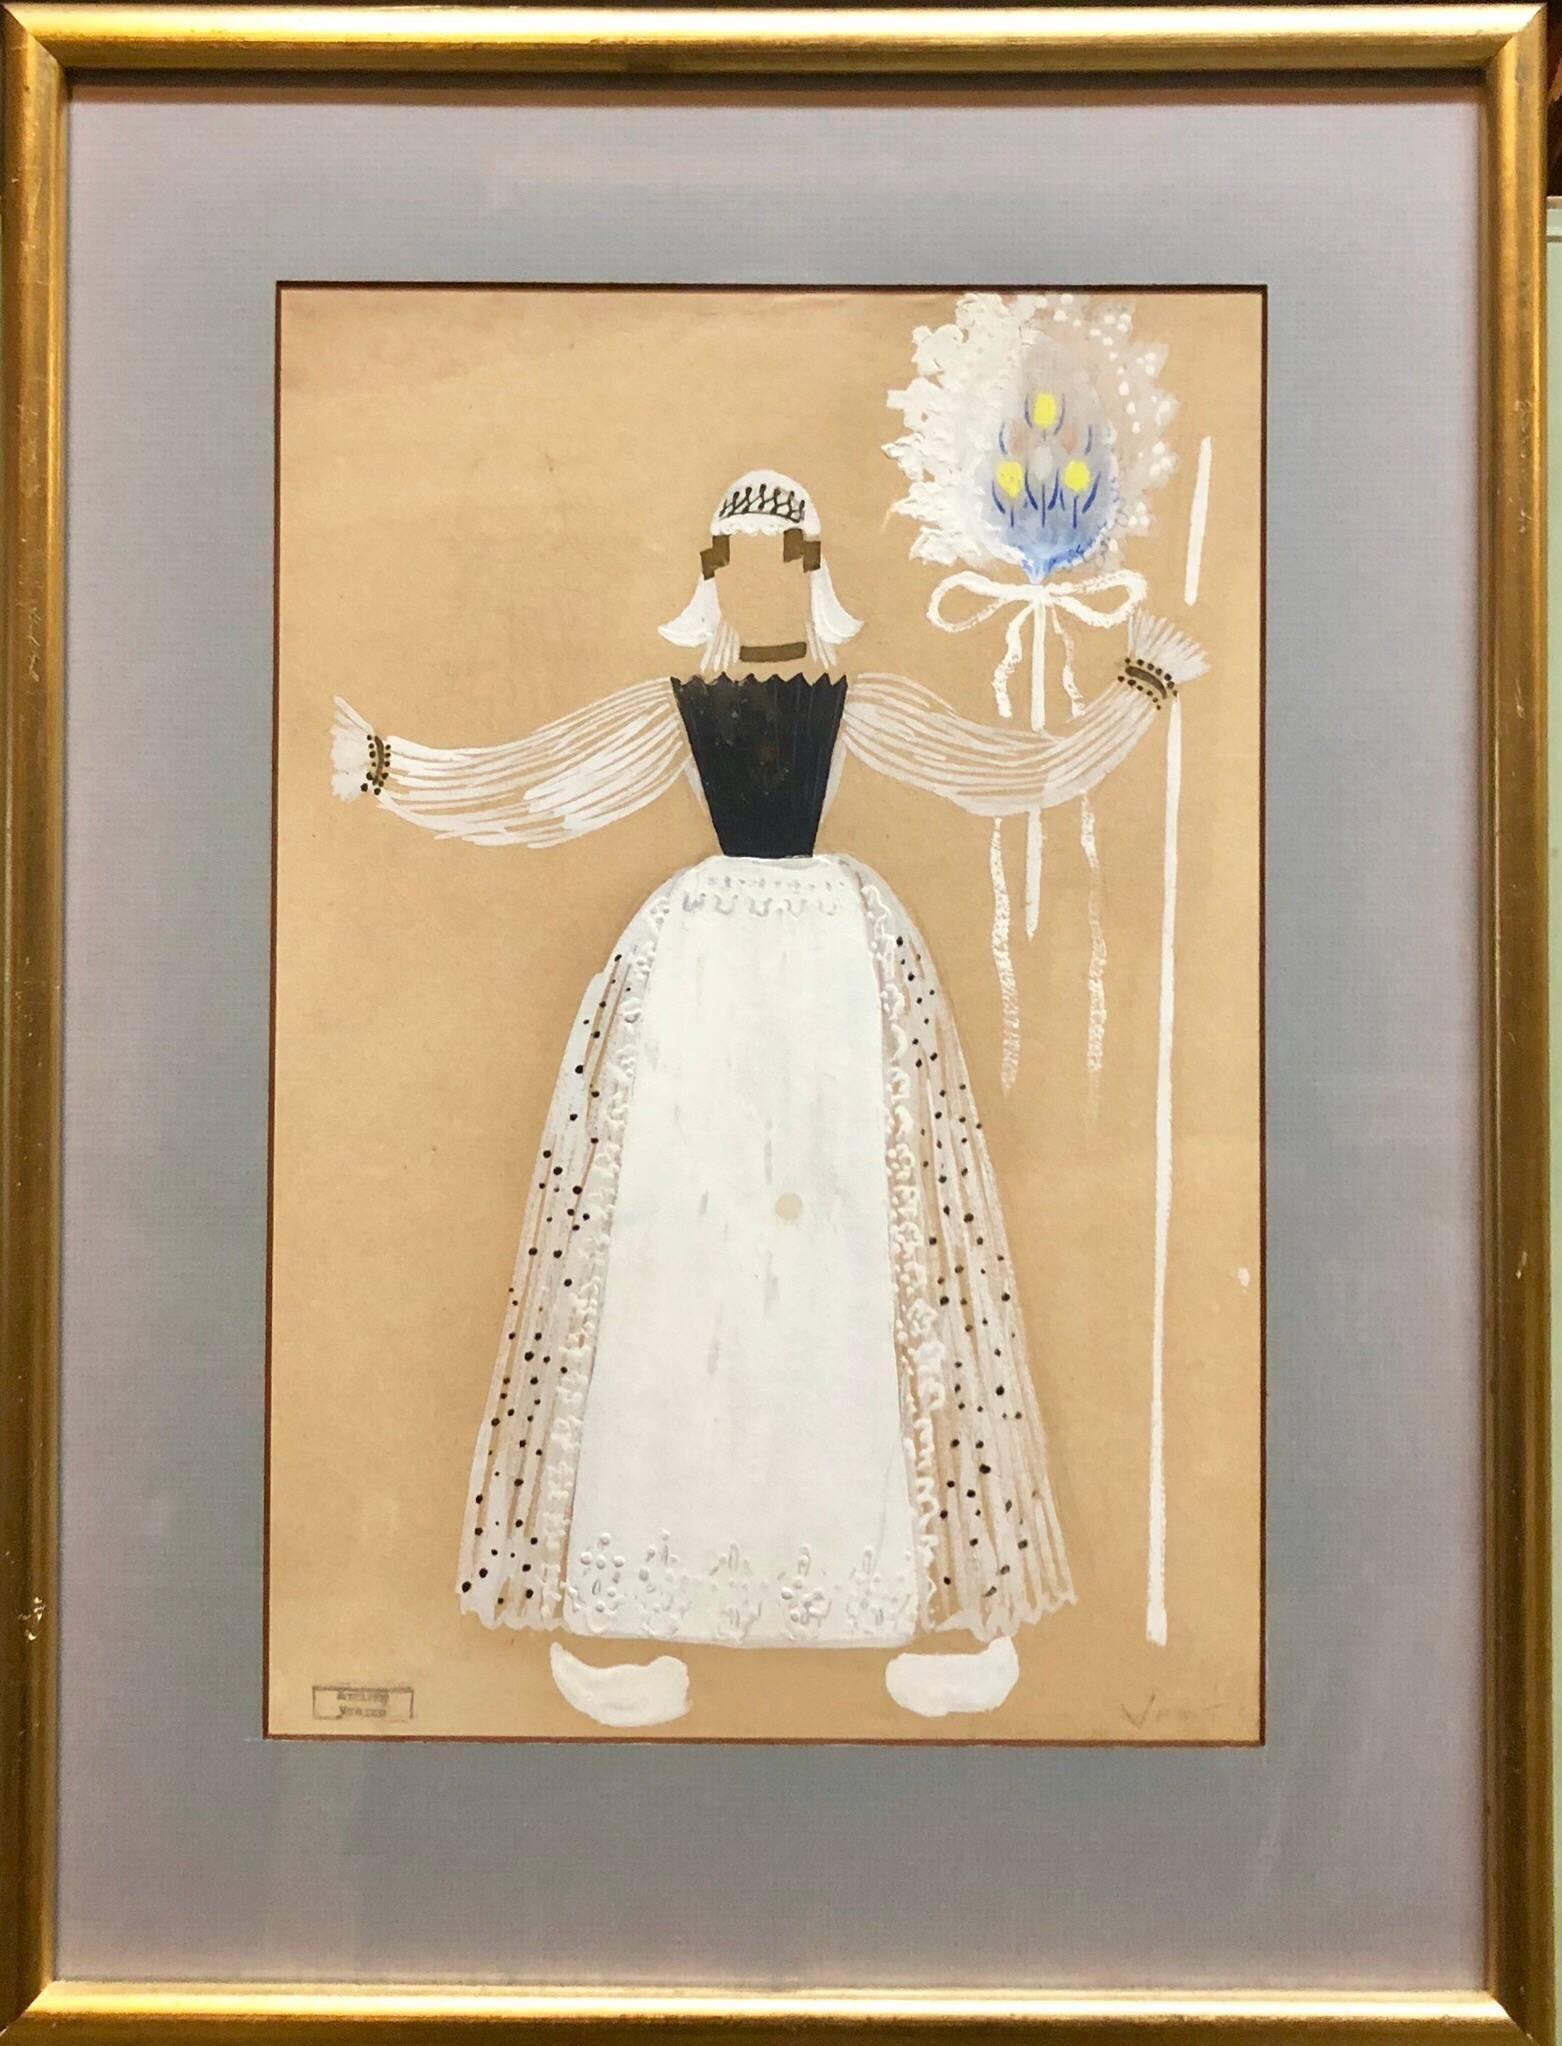 Original Art Deco Theatre Costume Illustration Katinka Gouache Painting, Drawing